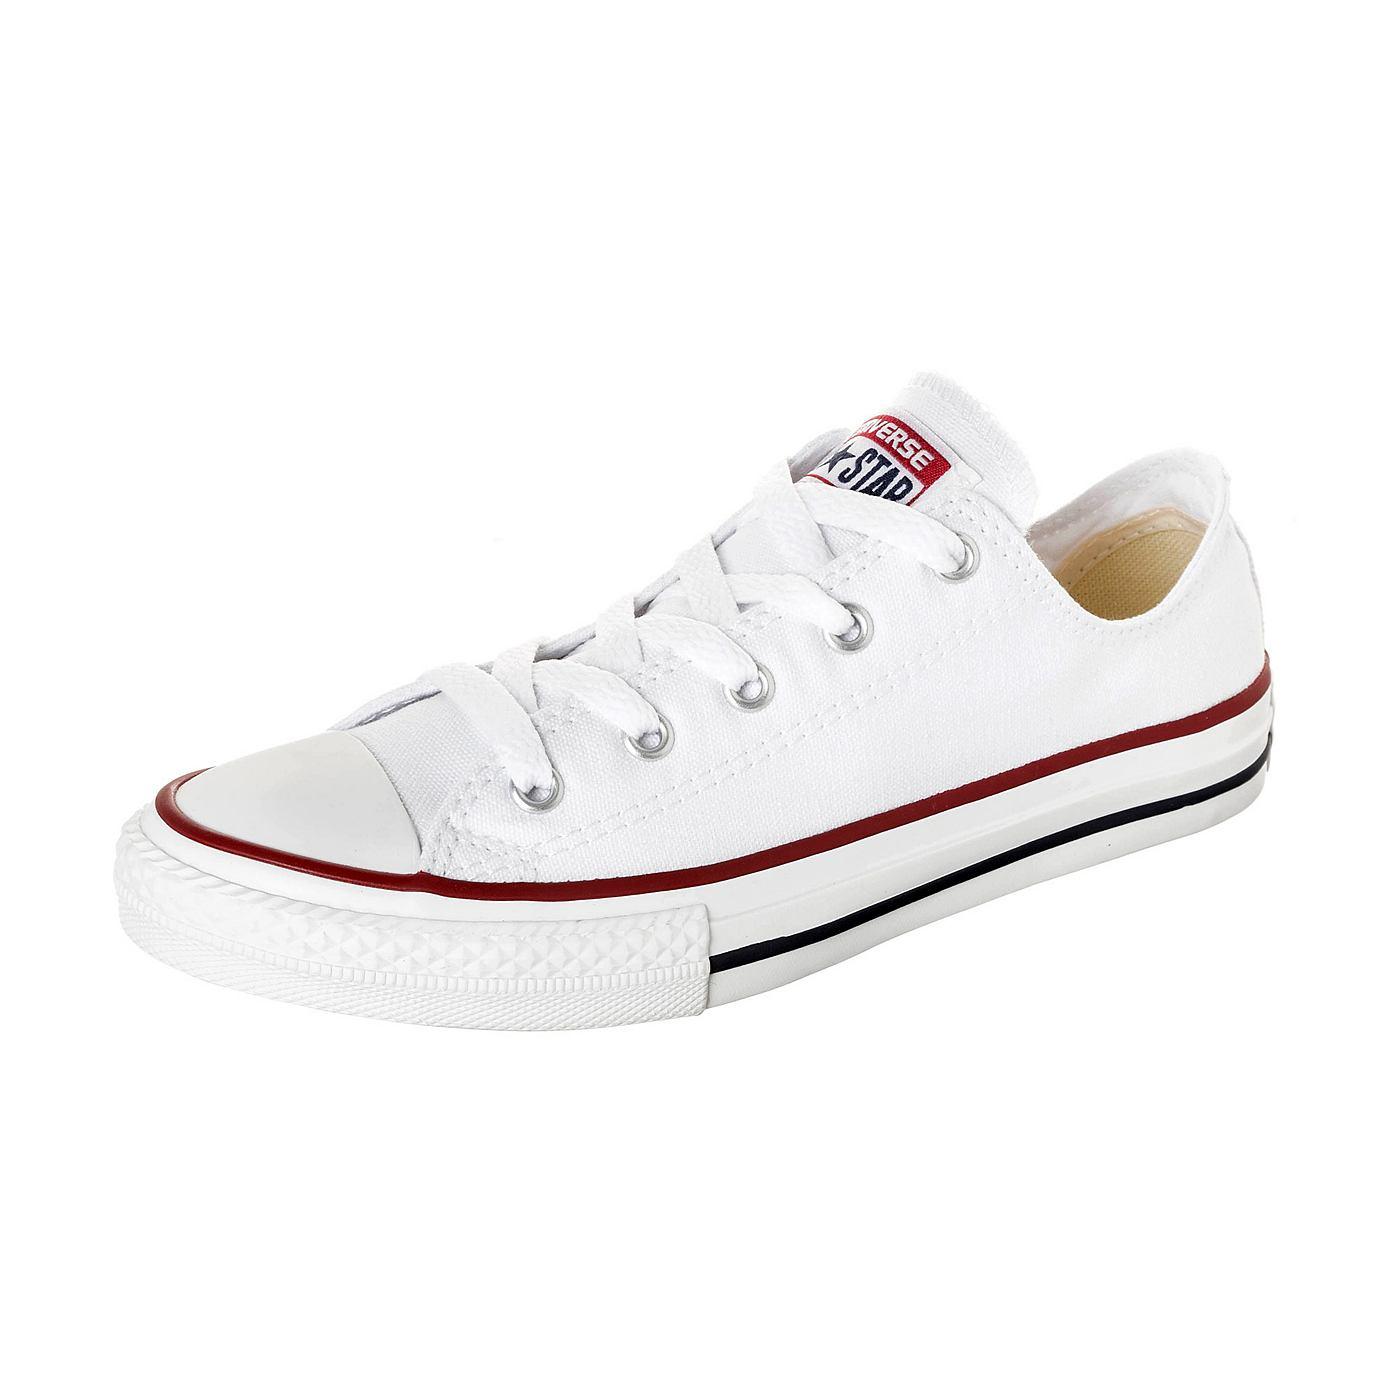 19d006829b7 CONVERSE Star Player EV 2V OX Sneaker Kleinkinder ab 39.95 €.  · CONVERSE  Chuck Taylor All ...